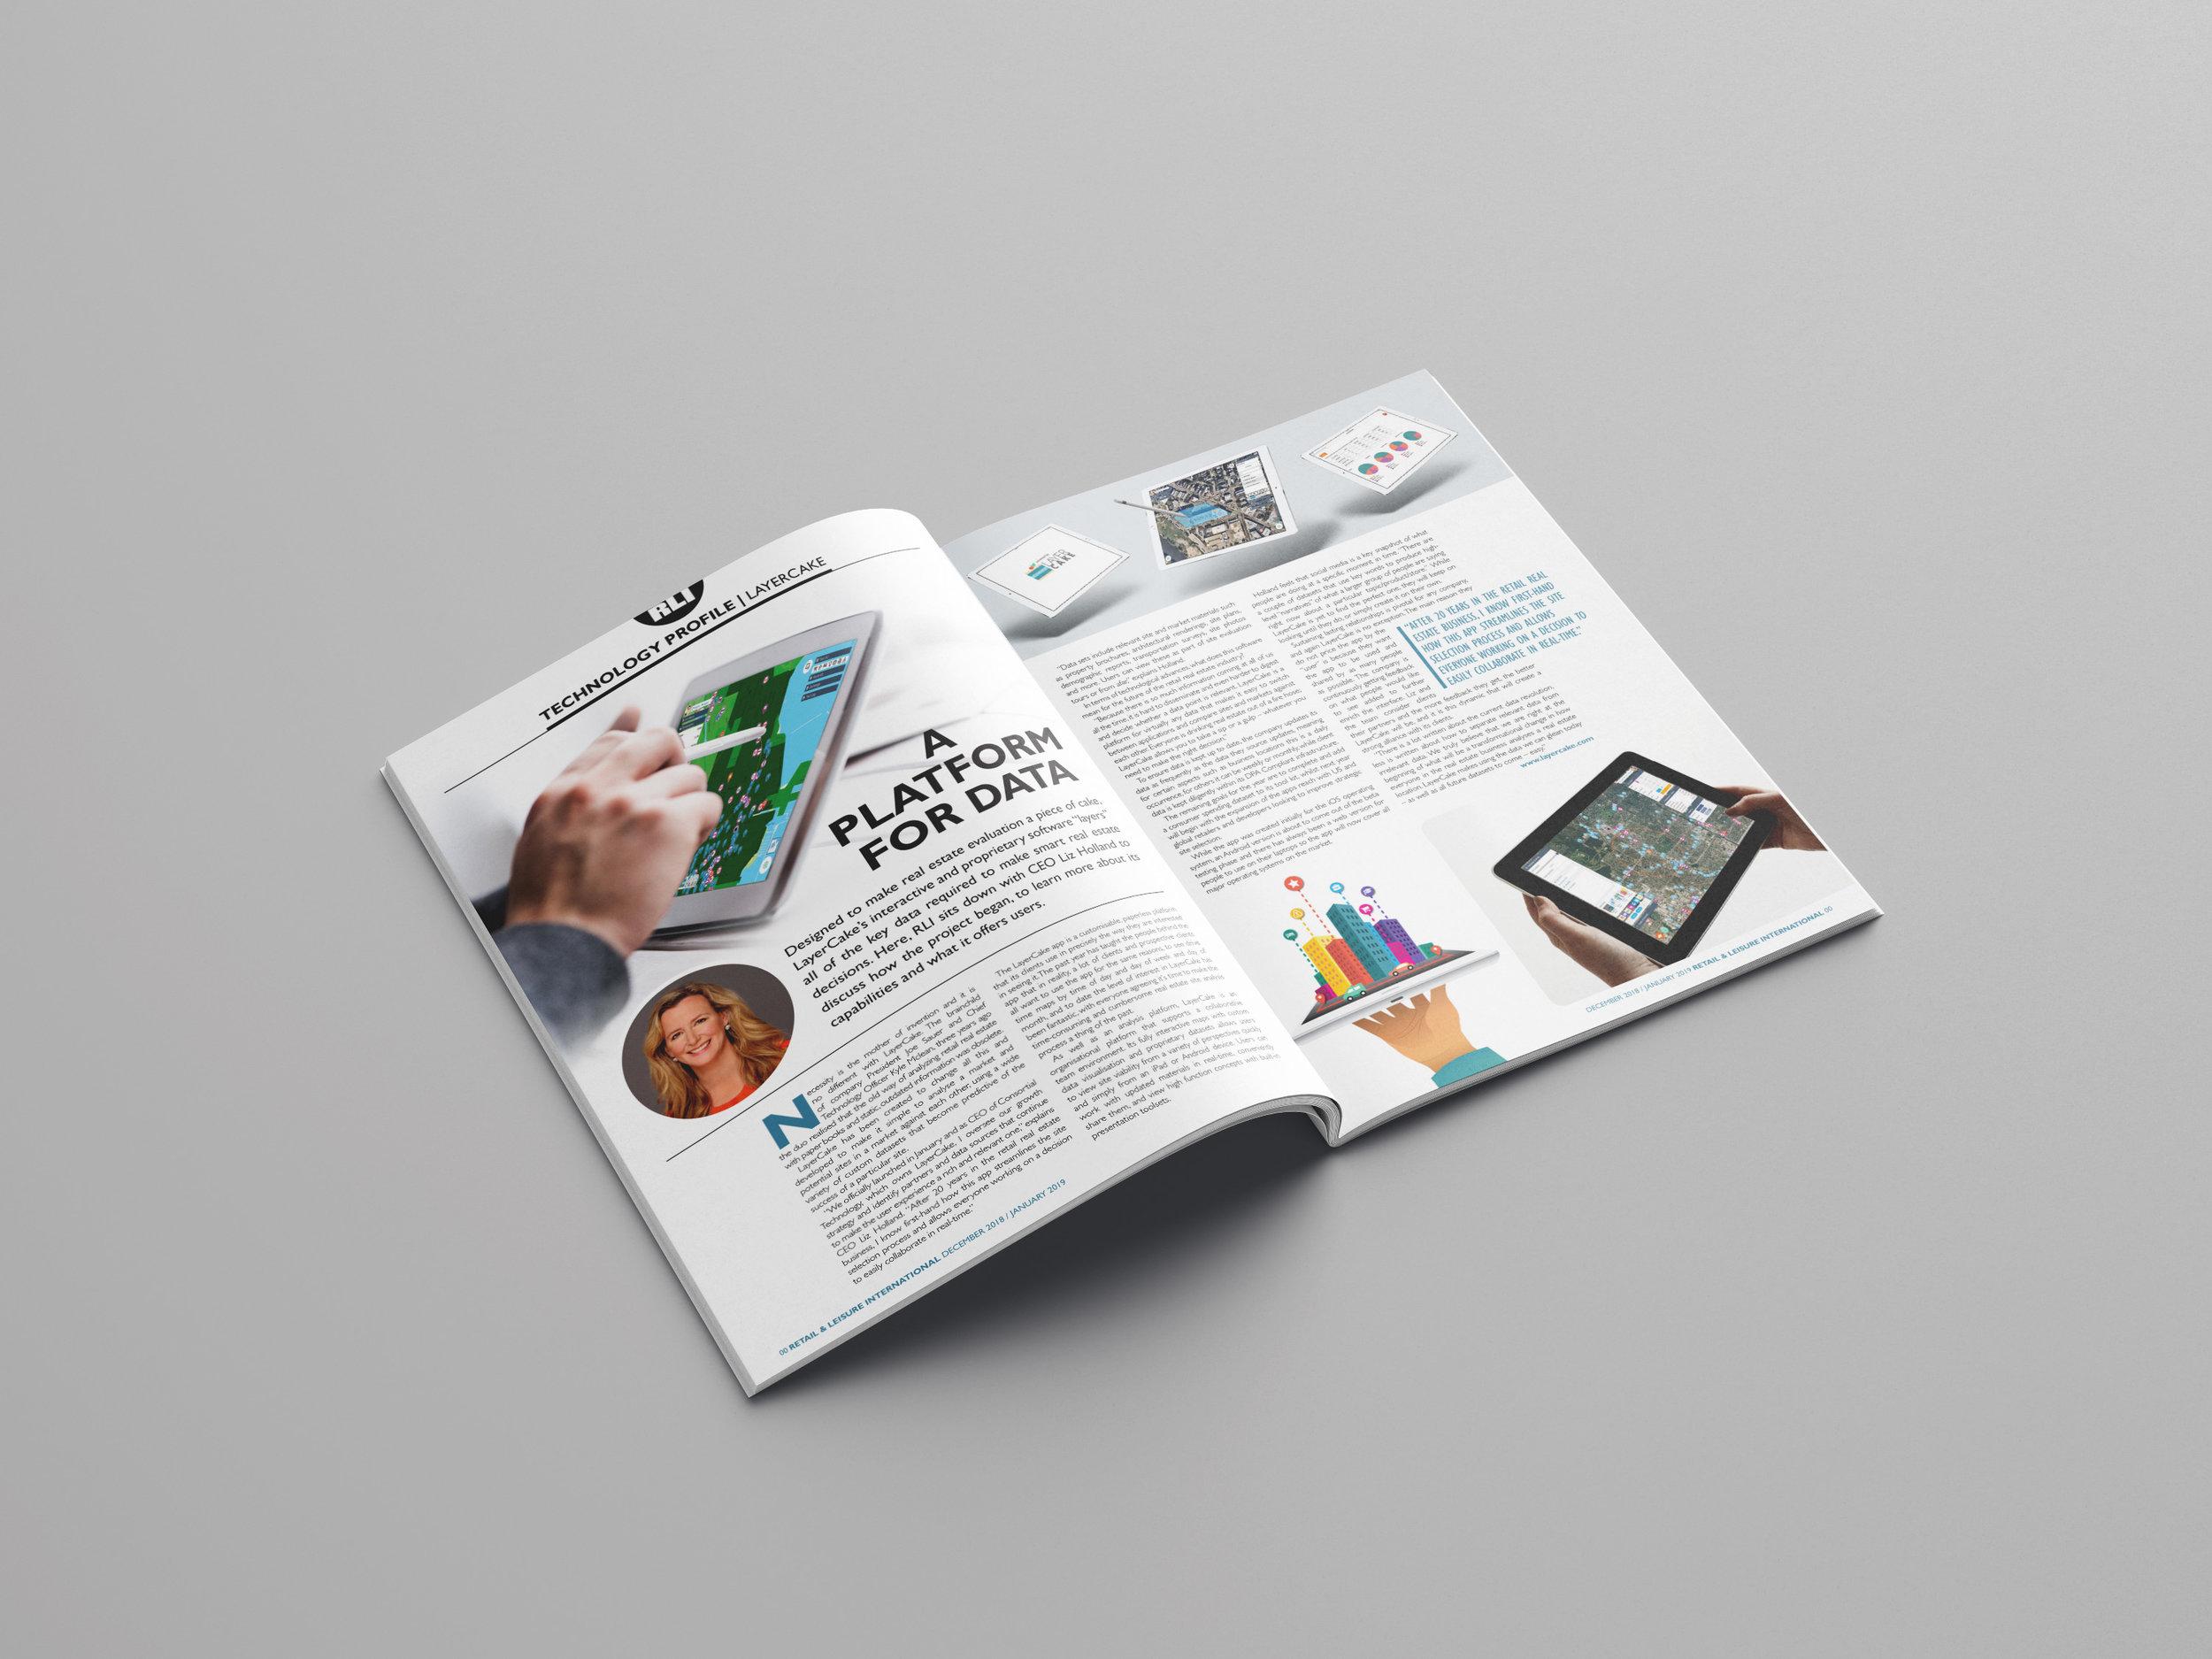 Free_A4_Brochure_Mockup_01_LayerCake-RLI-spread.jpg